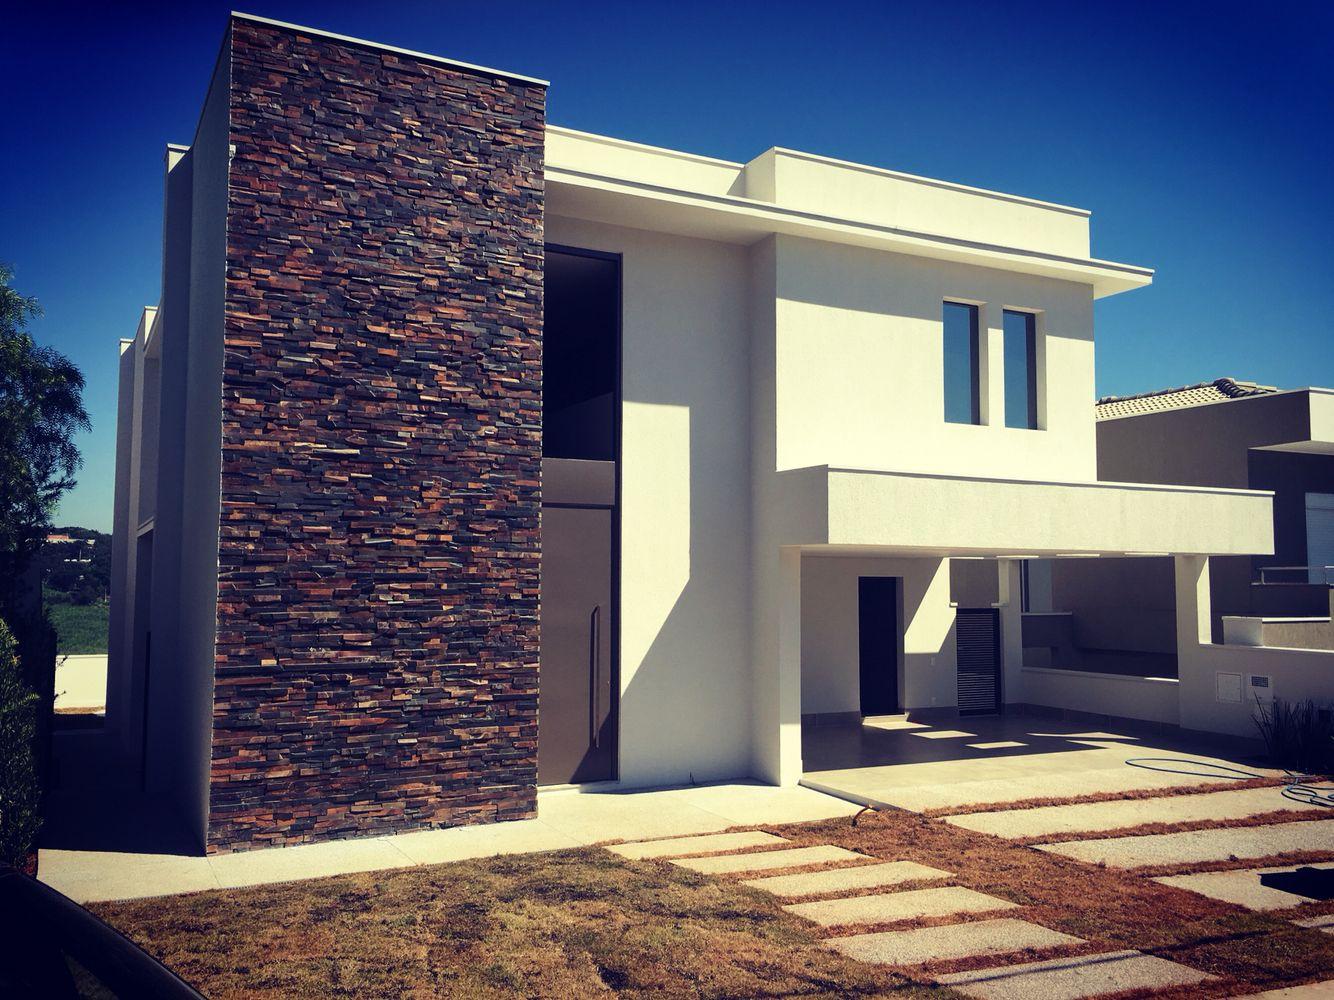 Pedraferro em fachada! Casa contemporânea Arquitecture